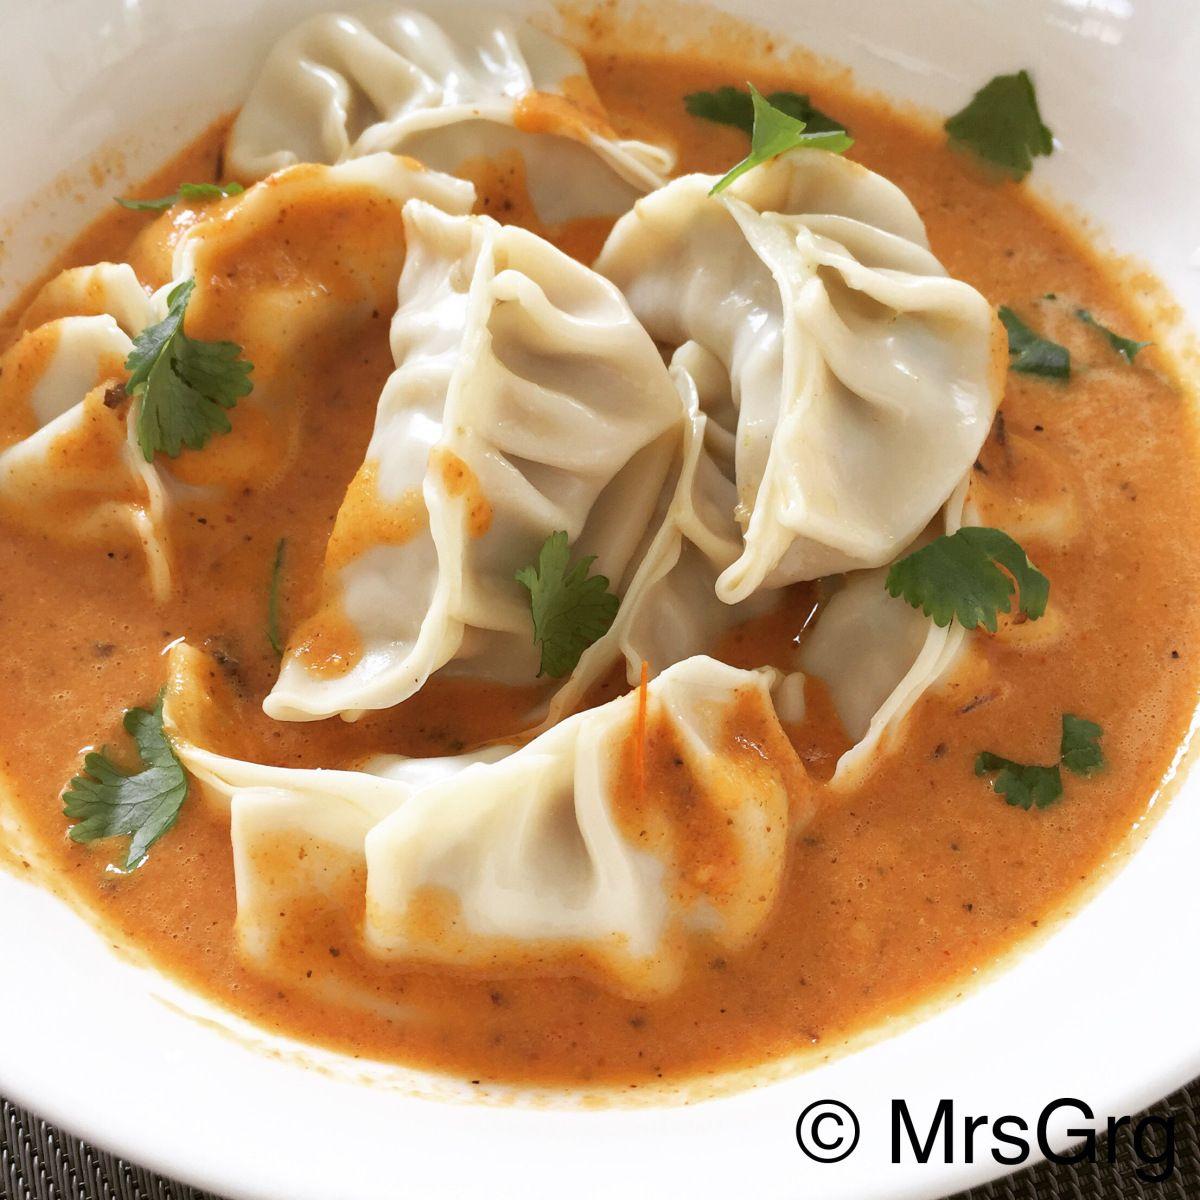 Dumpling Soup Woolworths Languageen: Nepali Food Recipes Pdf